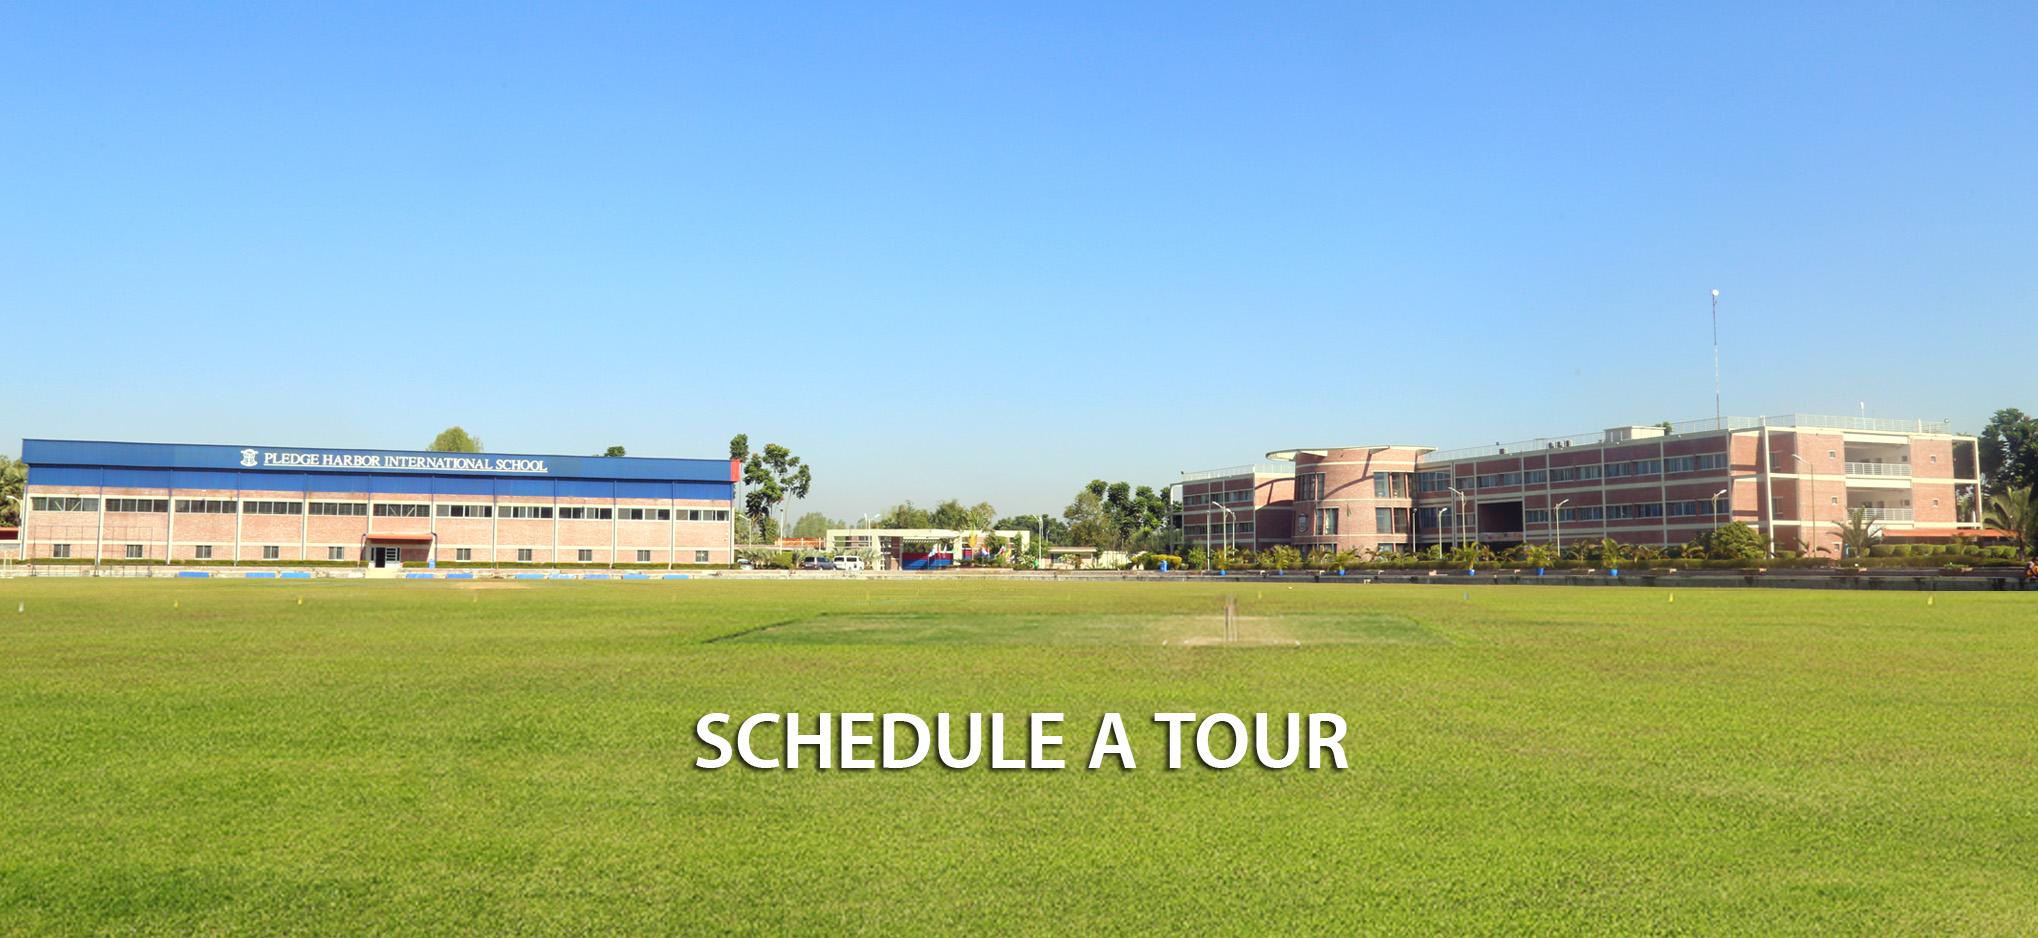 schedule-a-tour-1